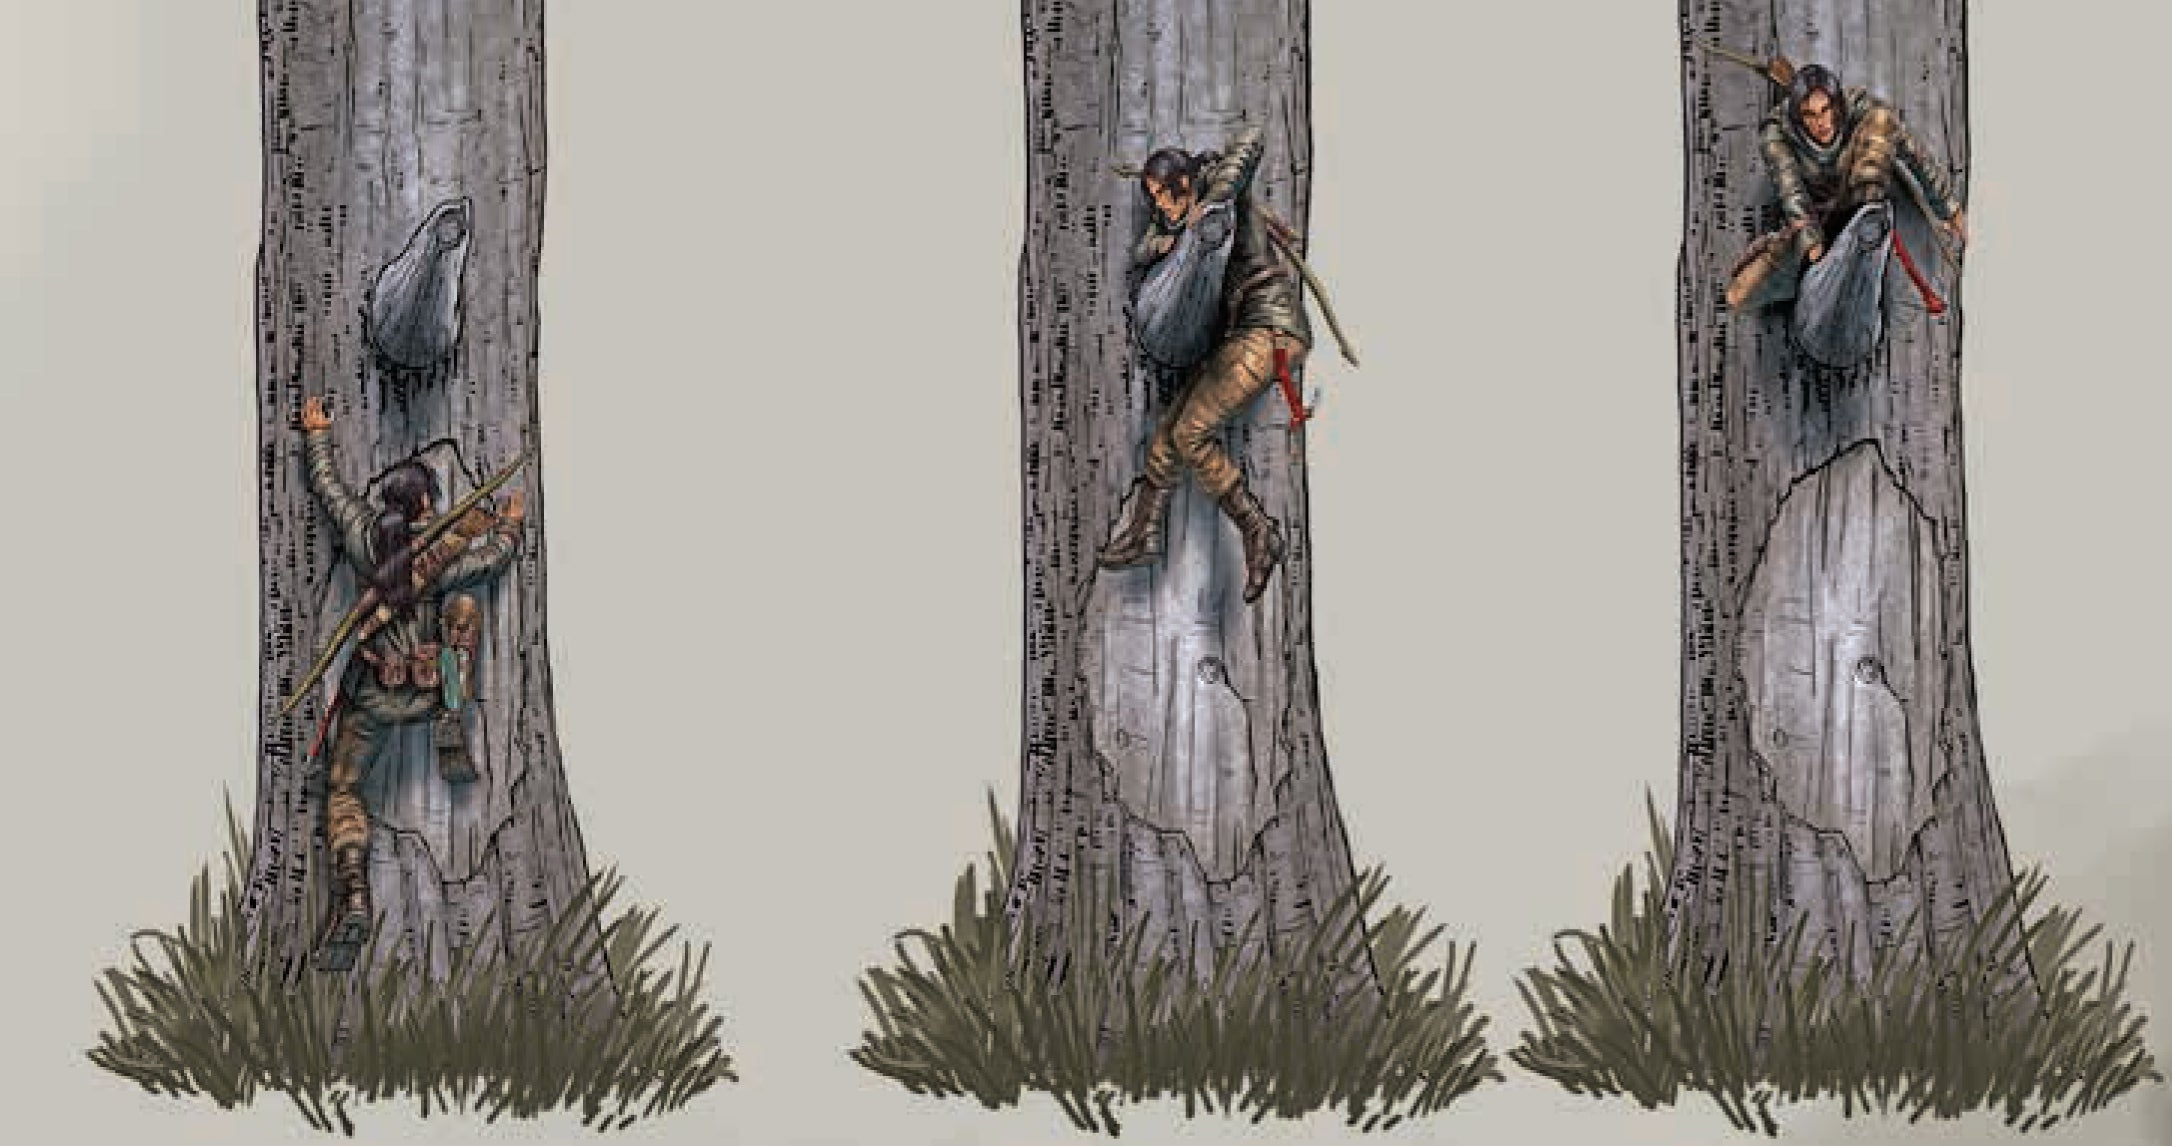 An image of Lara Croft climbing a tree.